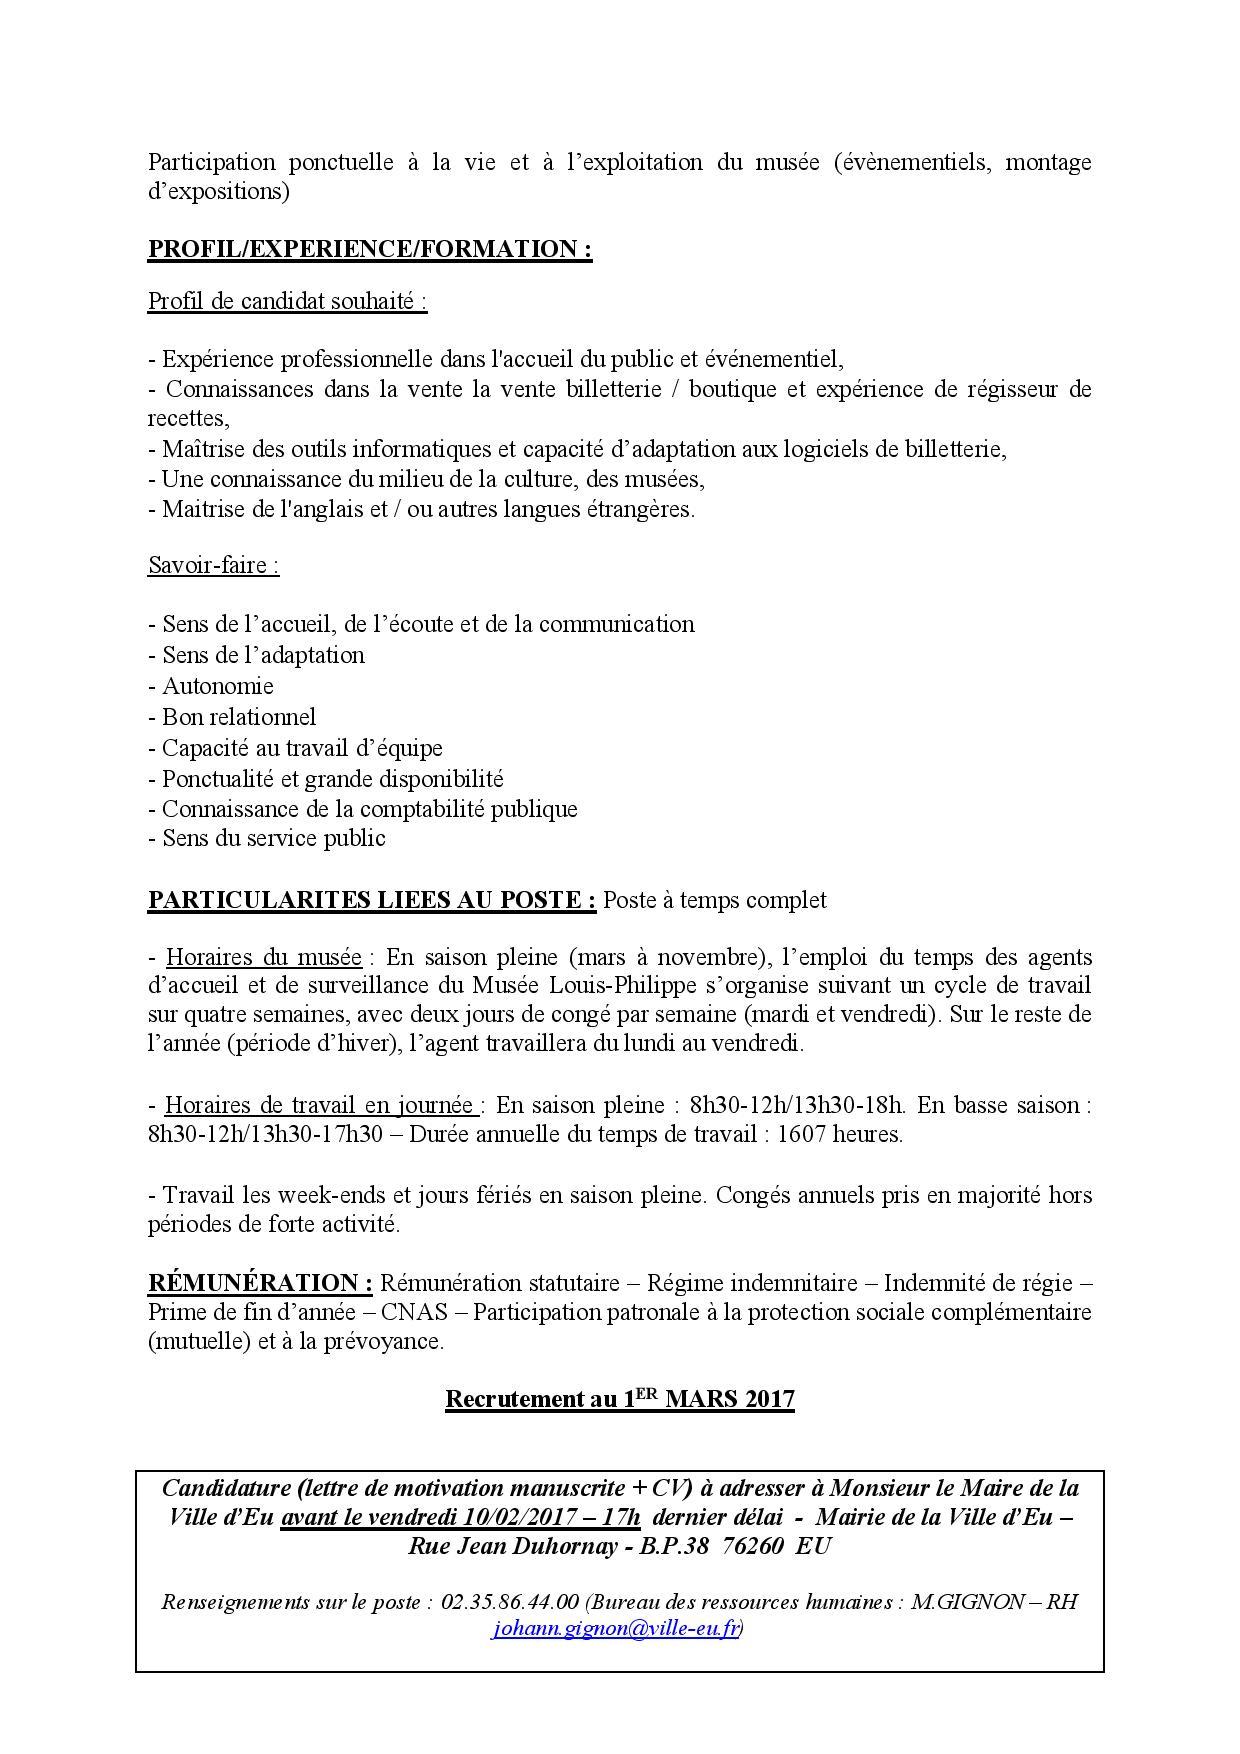 canada resume format correction officer resume hadoop